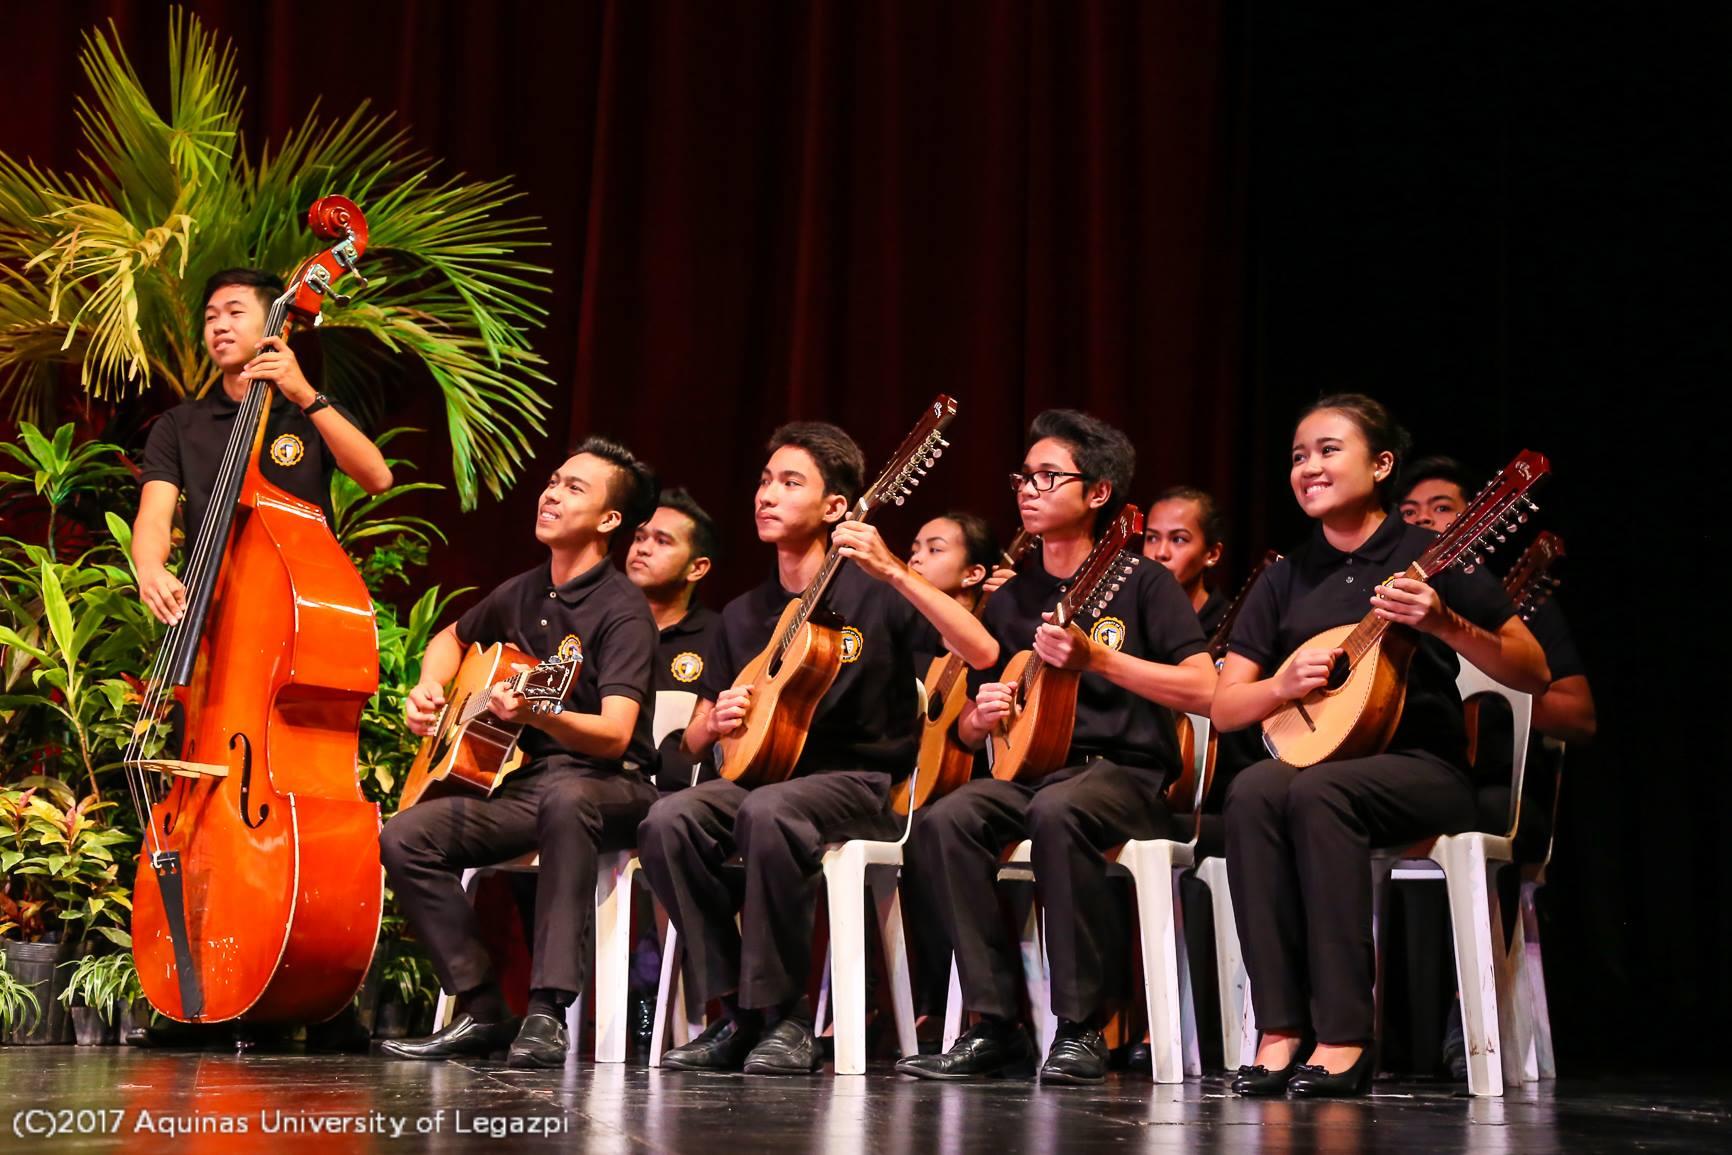 Indak Pilipinas Folkloric Dance Festival & Conference